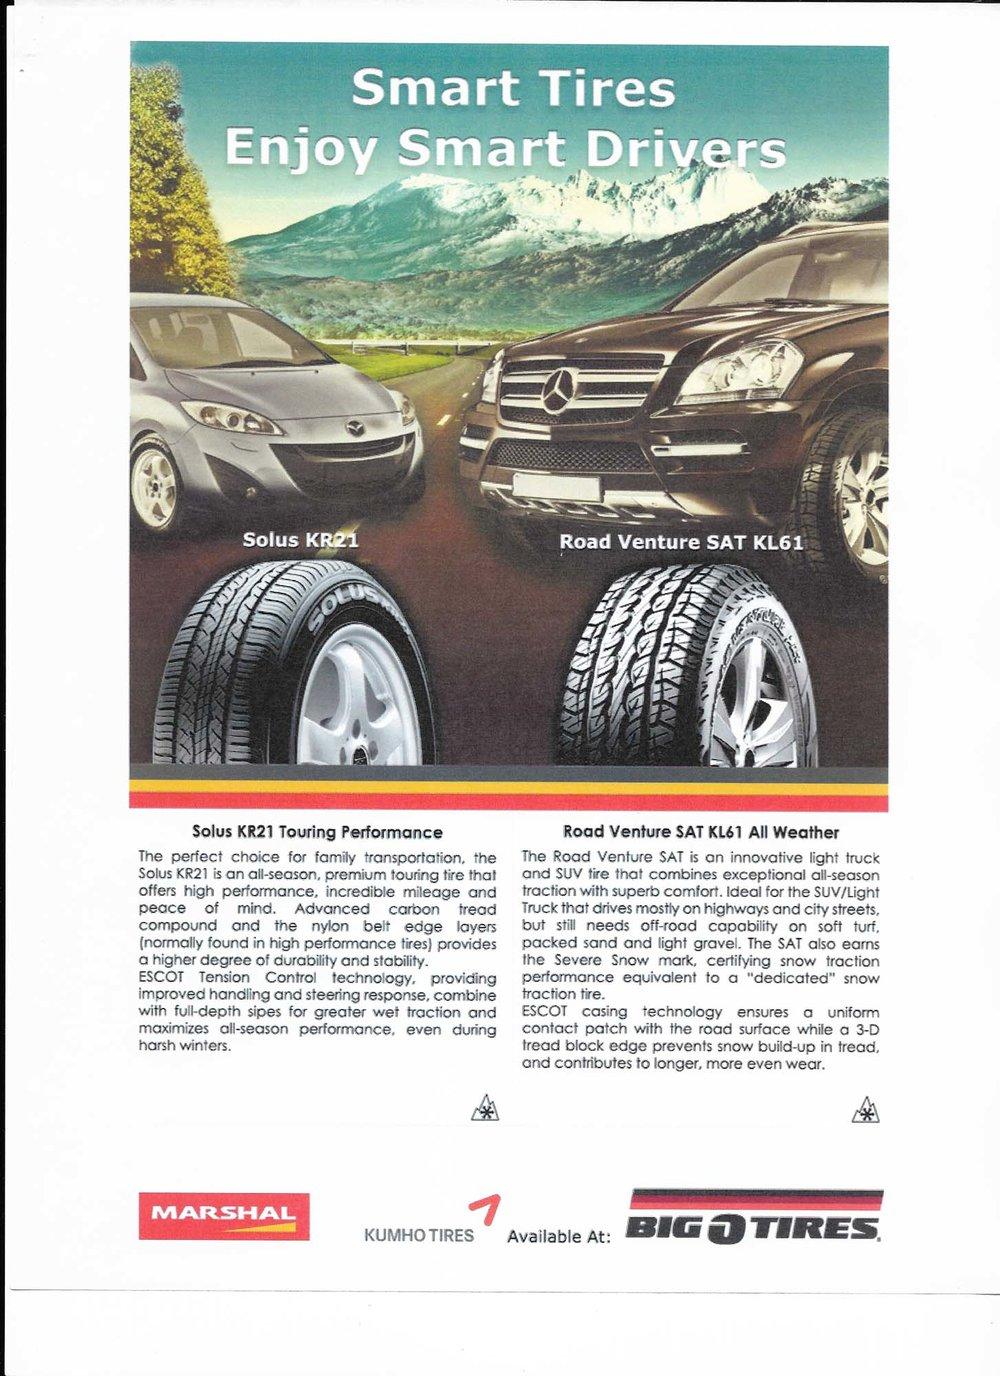 Big-O-Tires 15.jpg